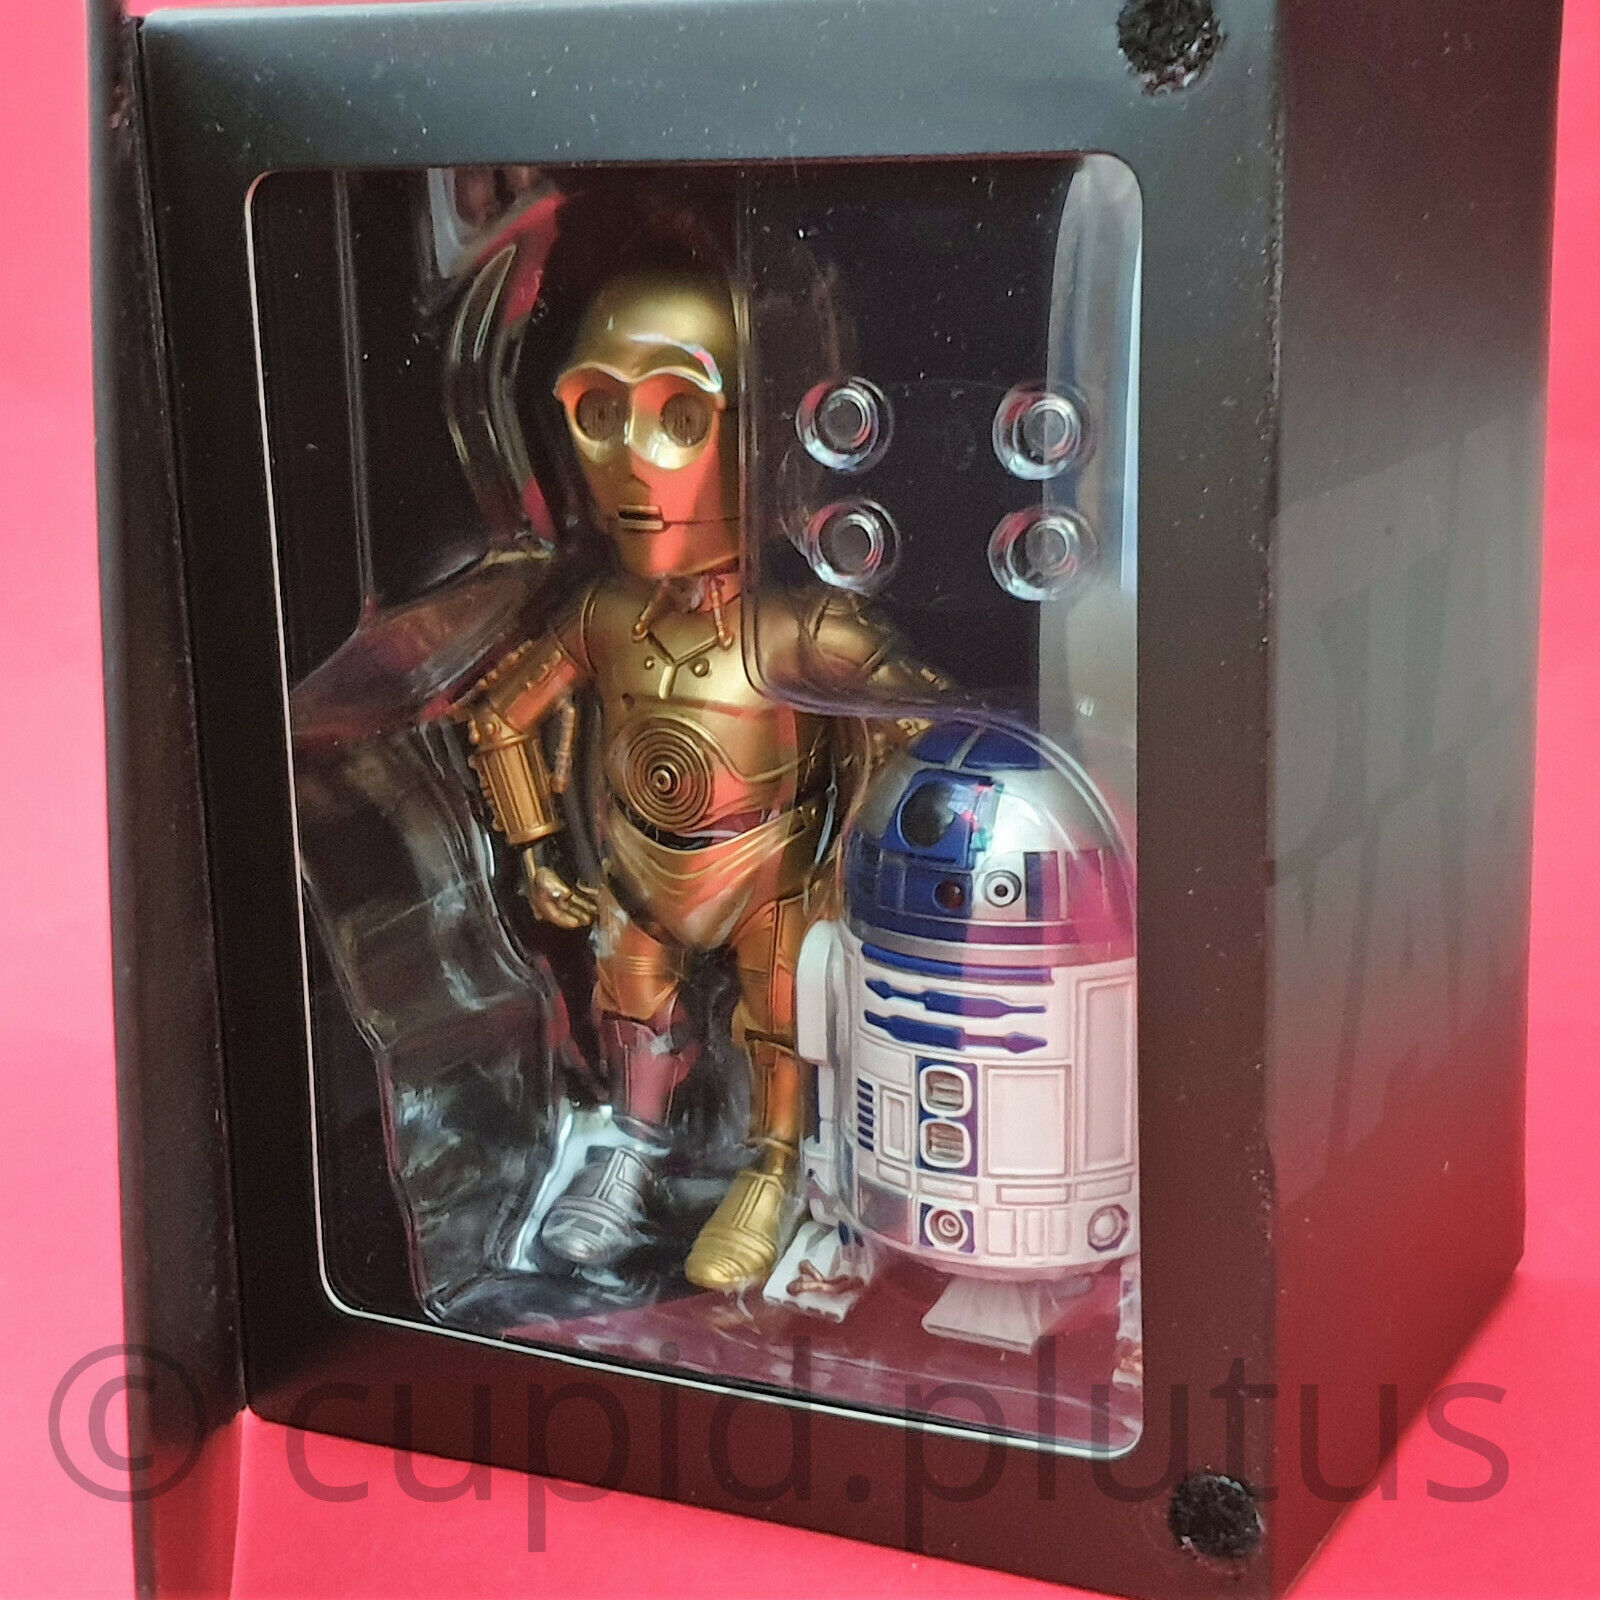 Herocross Star Wars HMF 024 C-3PO & R2-D2 Hybrid Metal Action Figure Set (NEW)